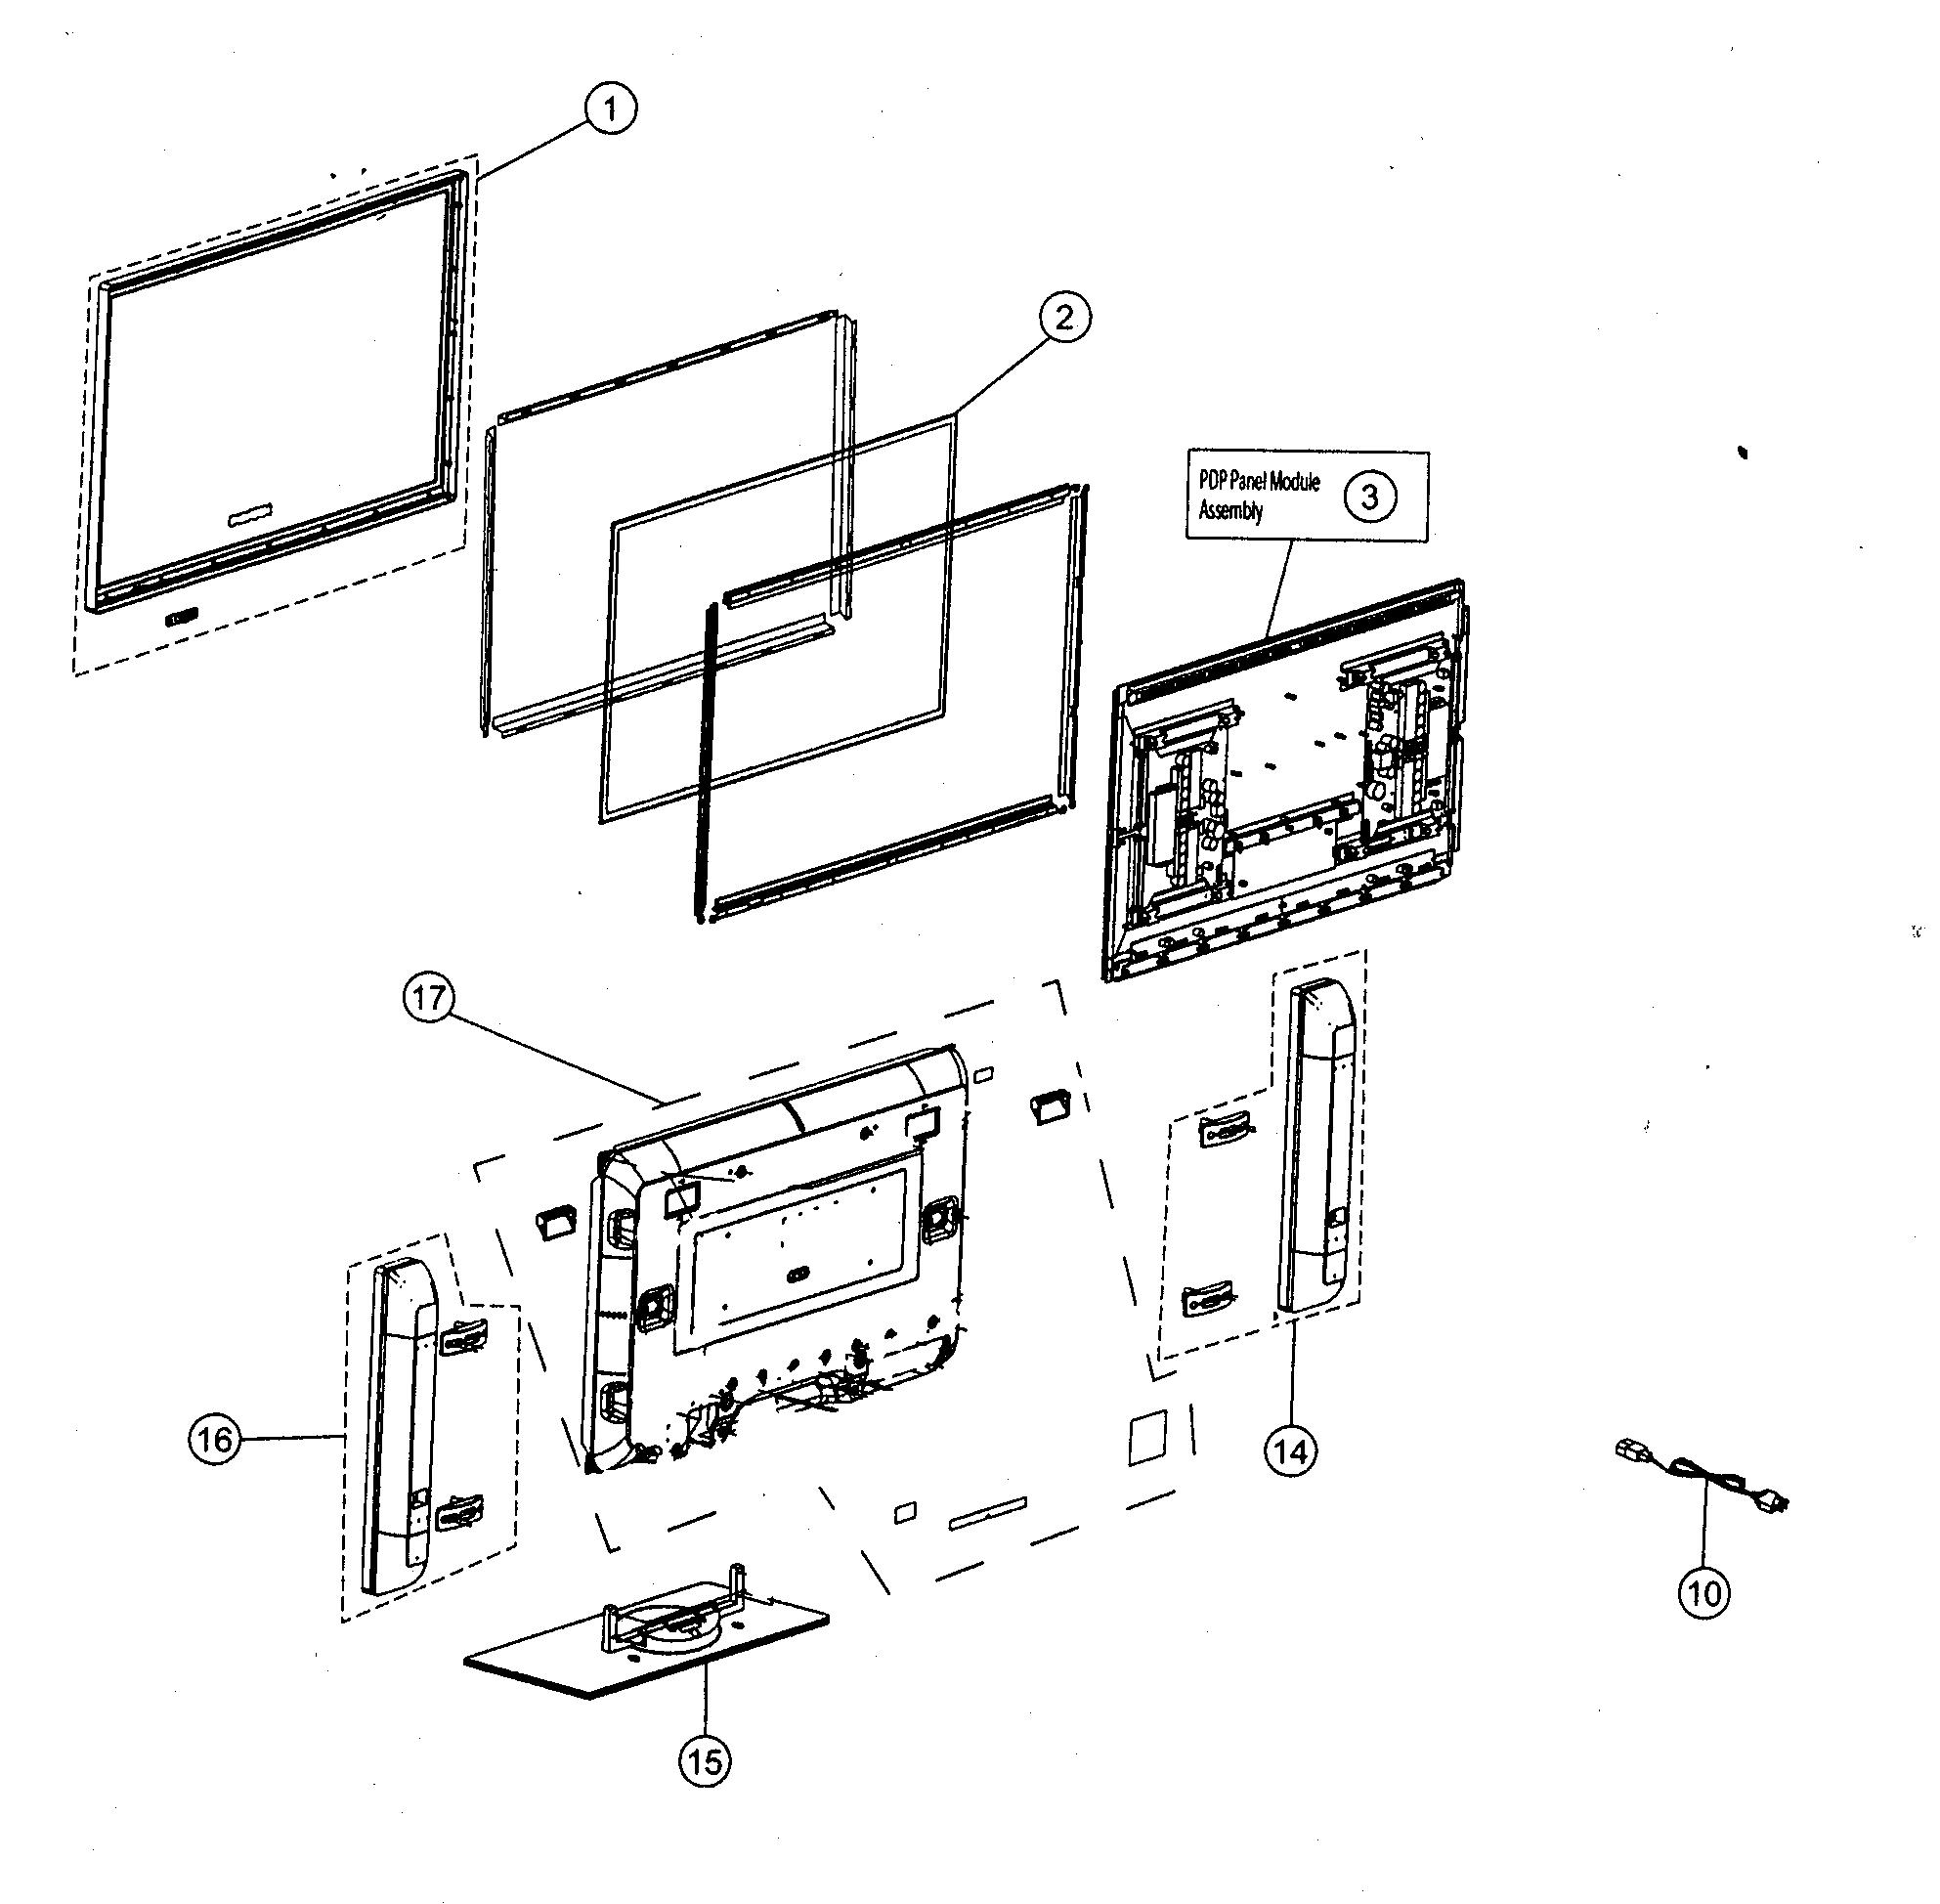 Hitachi model 42HDT55 plasma television genuine parts